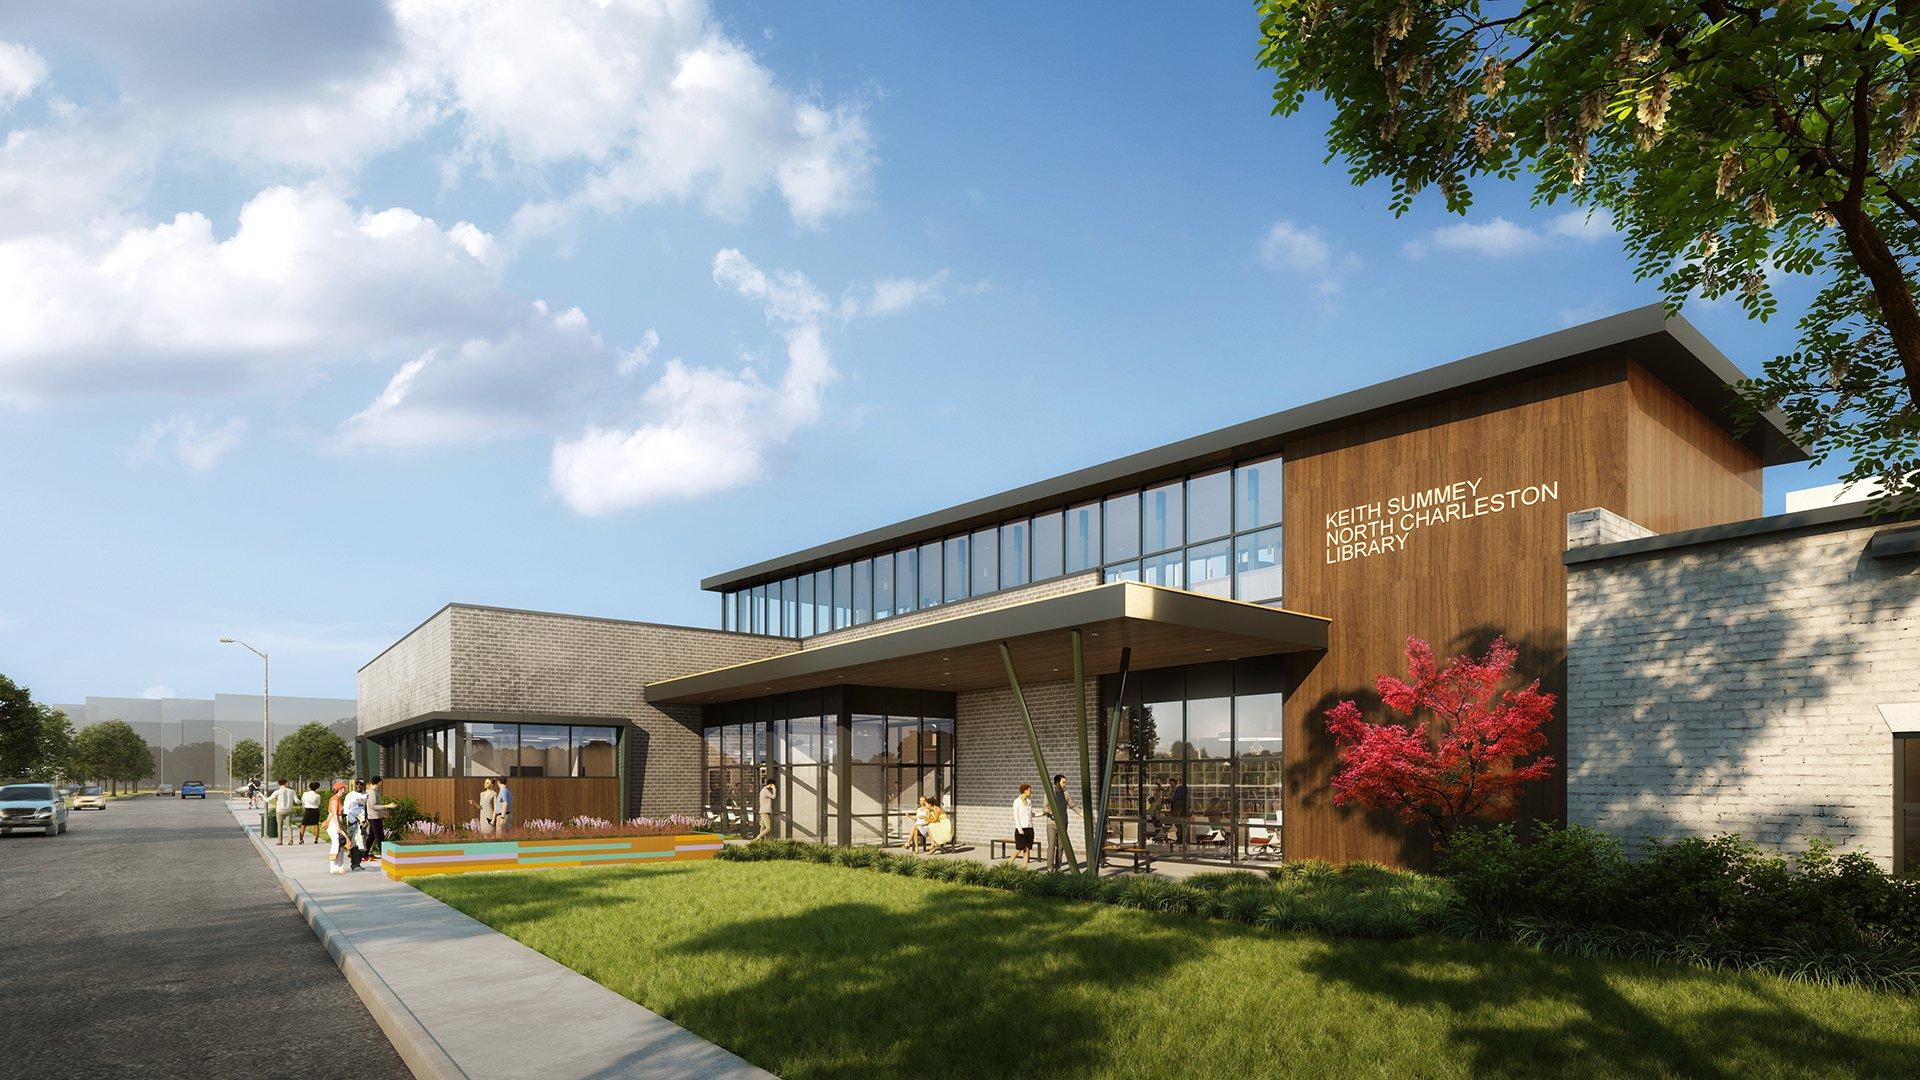 Keith Summey Library Breaks Ground in Charleston